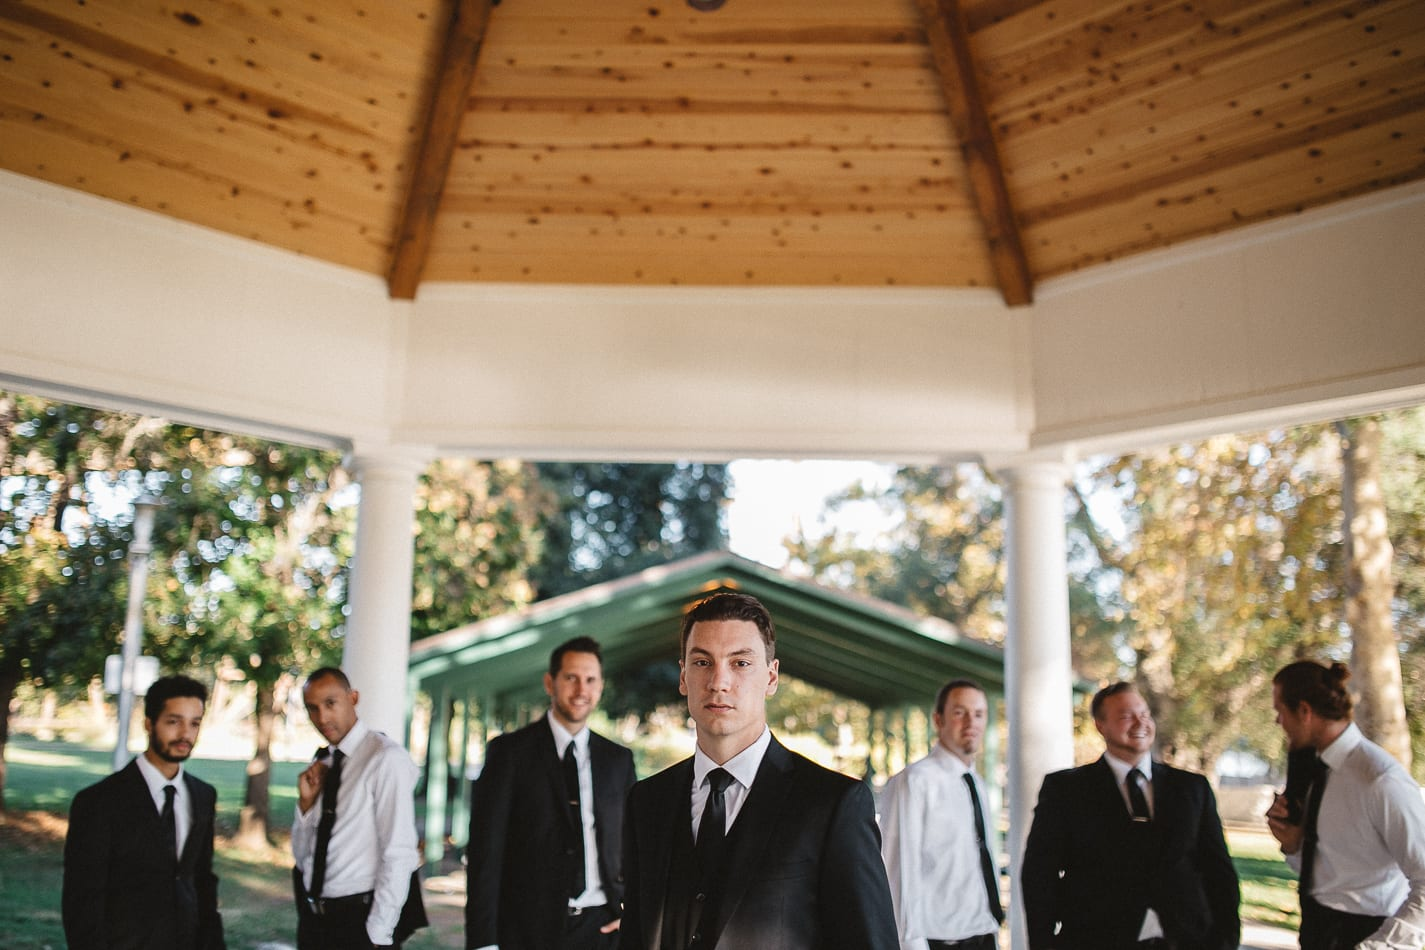 lake-redding-park-diesel-horse-bridge-view202-california-wedding-photographer-11